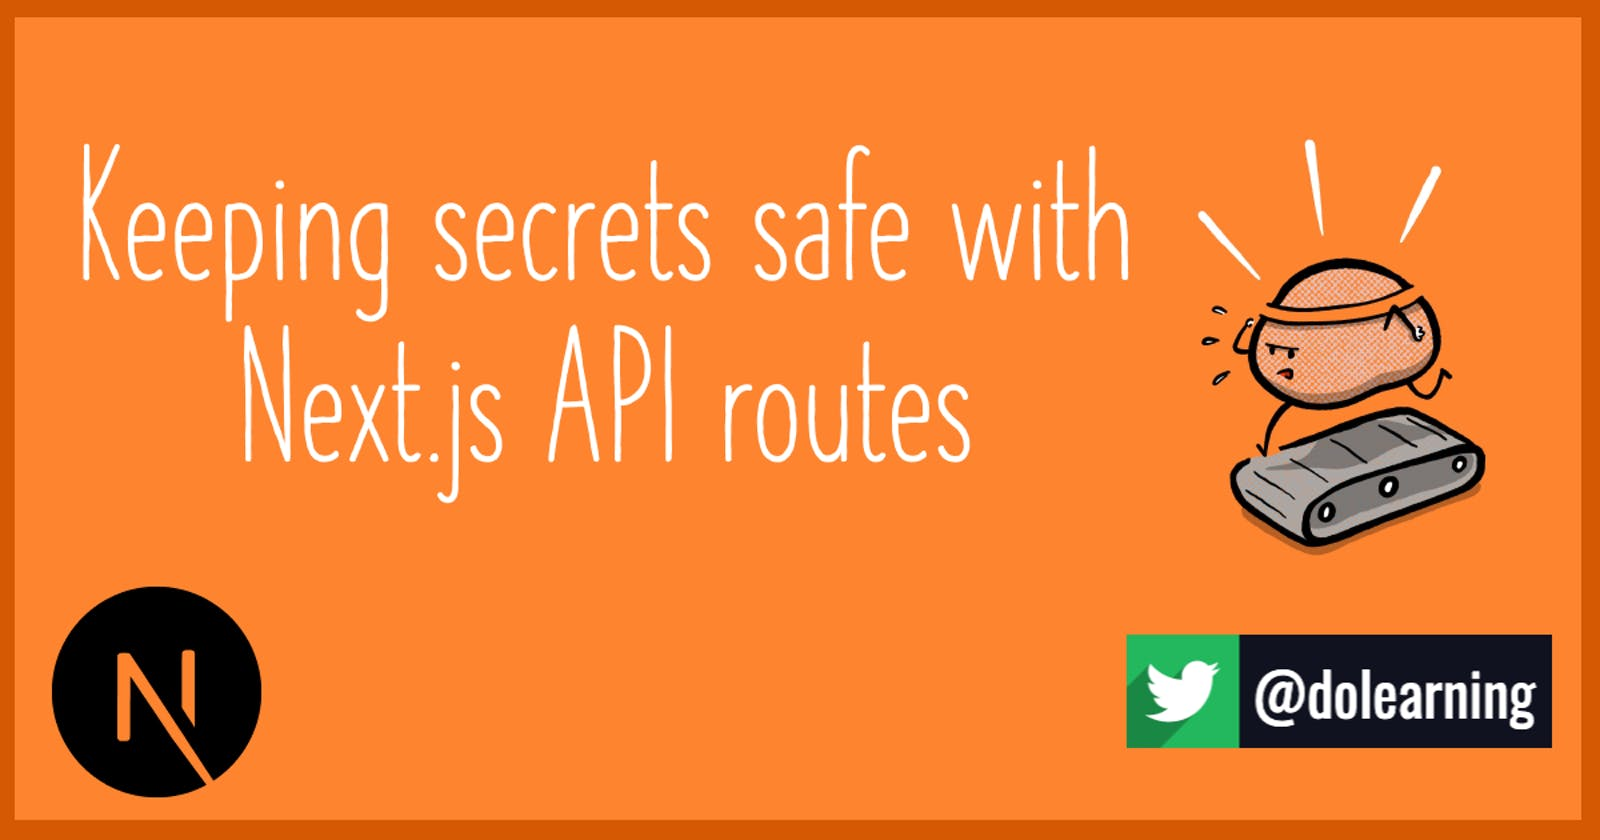 Keeping secrets safe with Next.js API routes